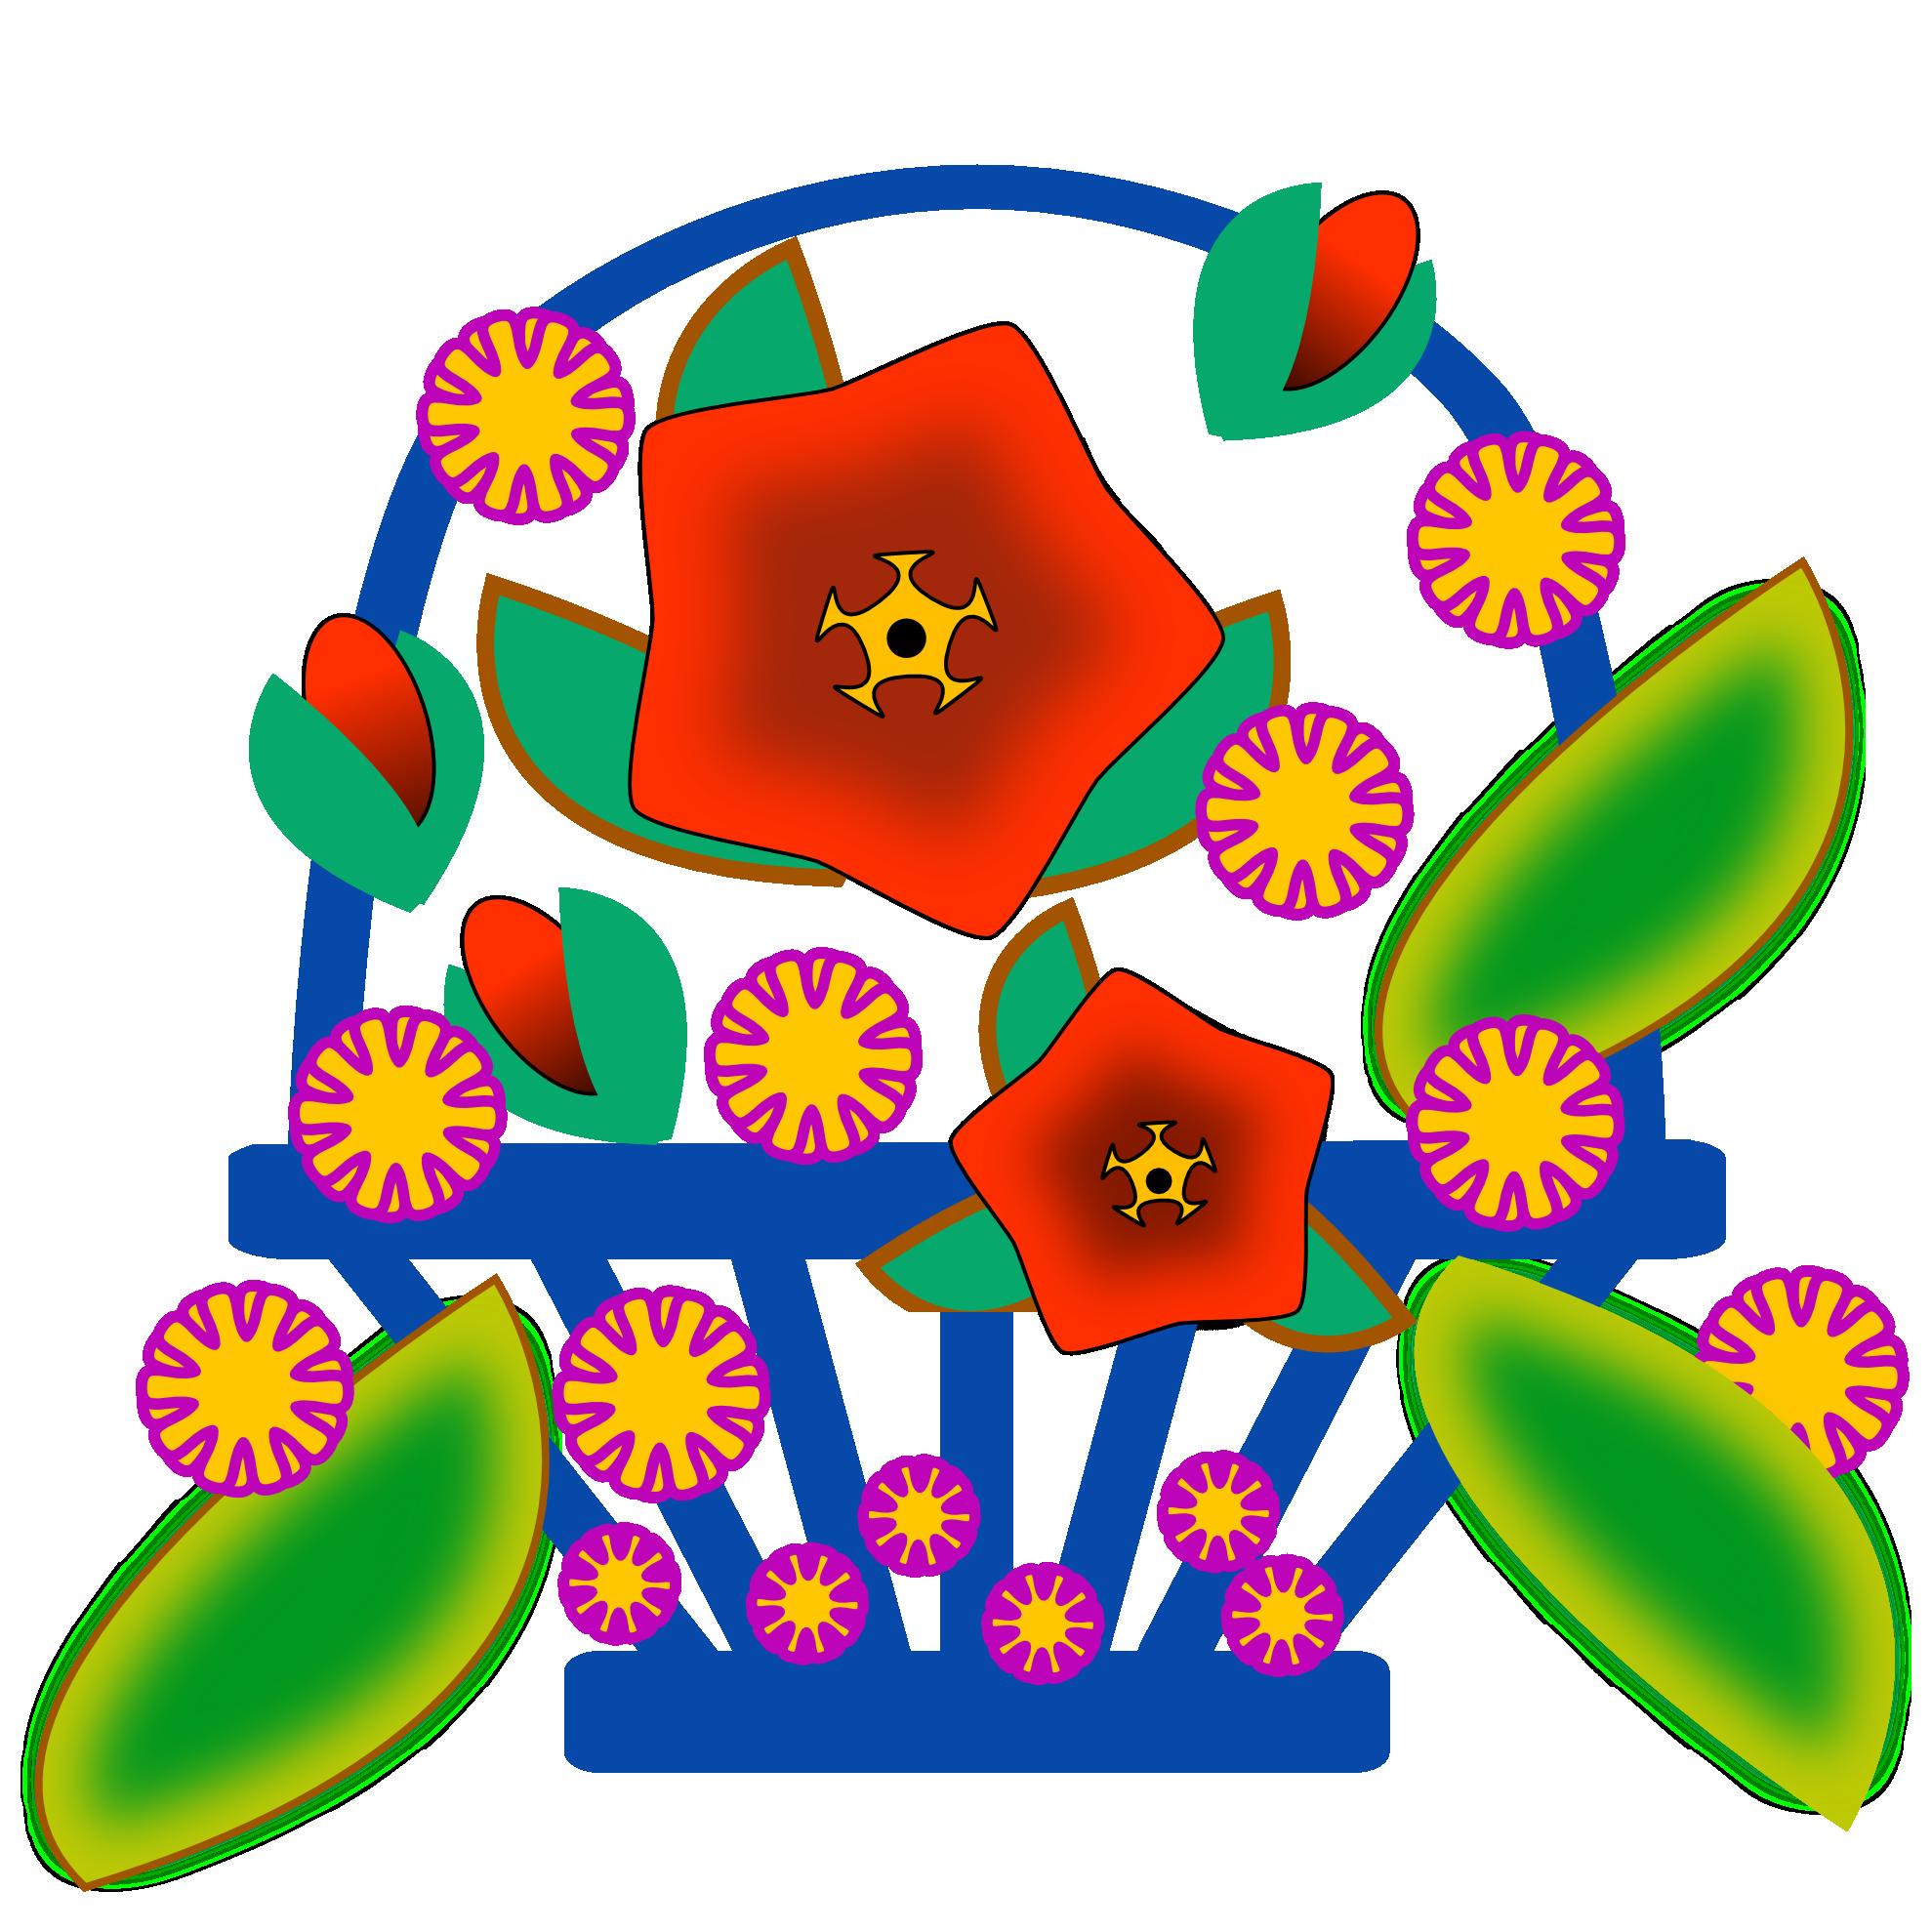 Decoration clipart cute. September design flower free